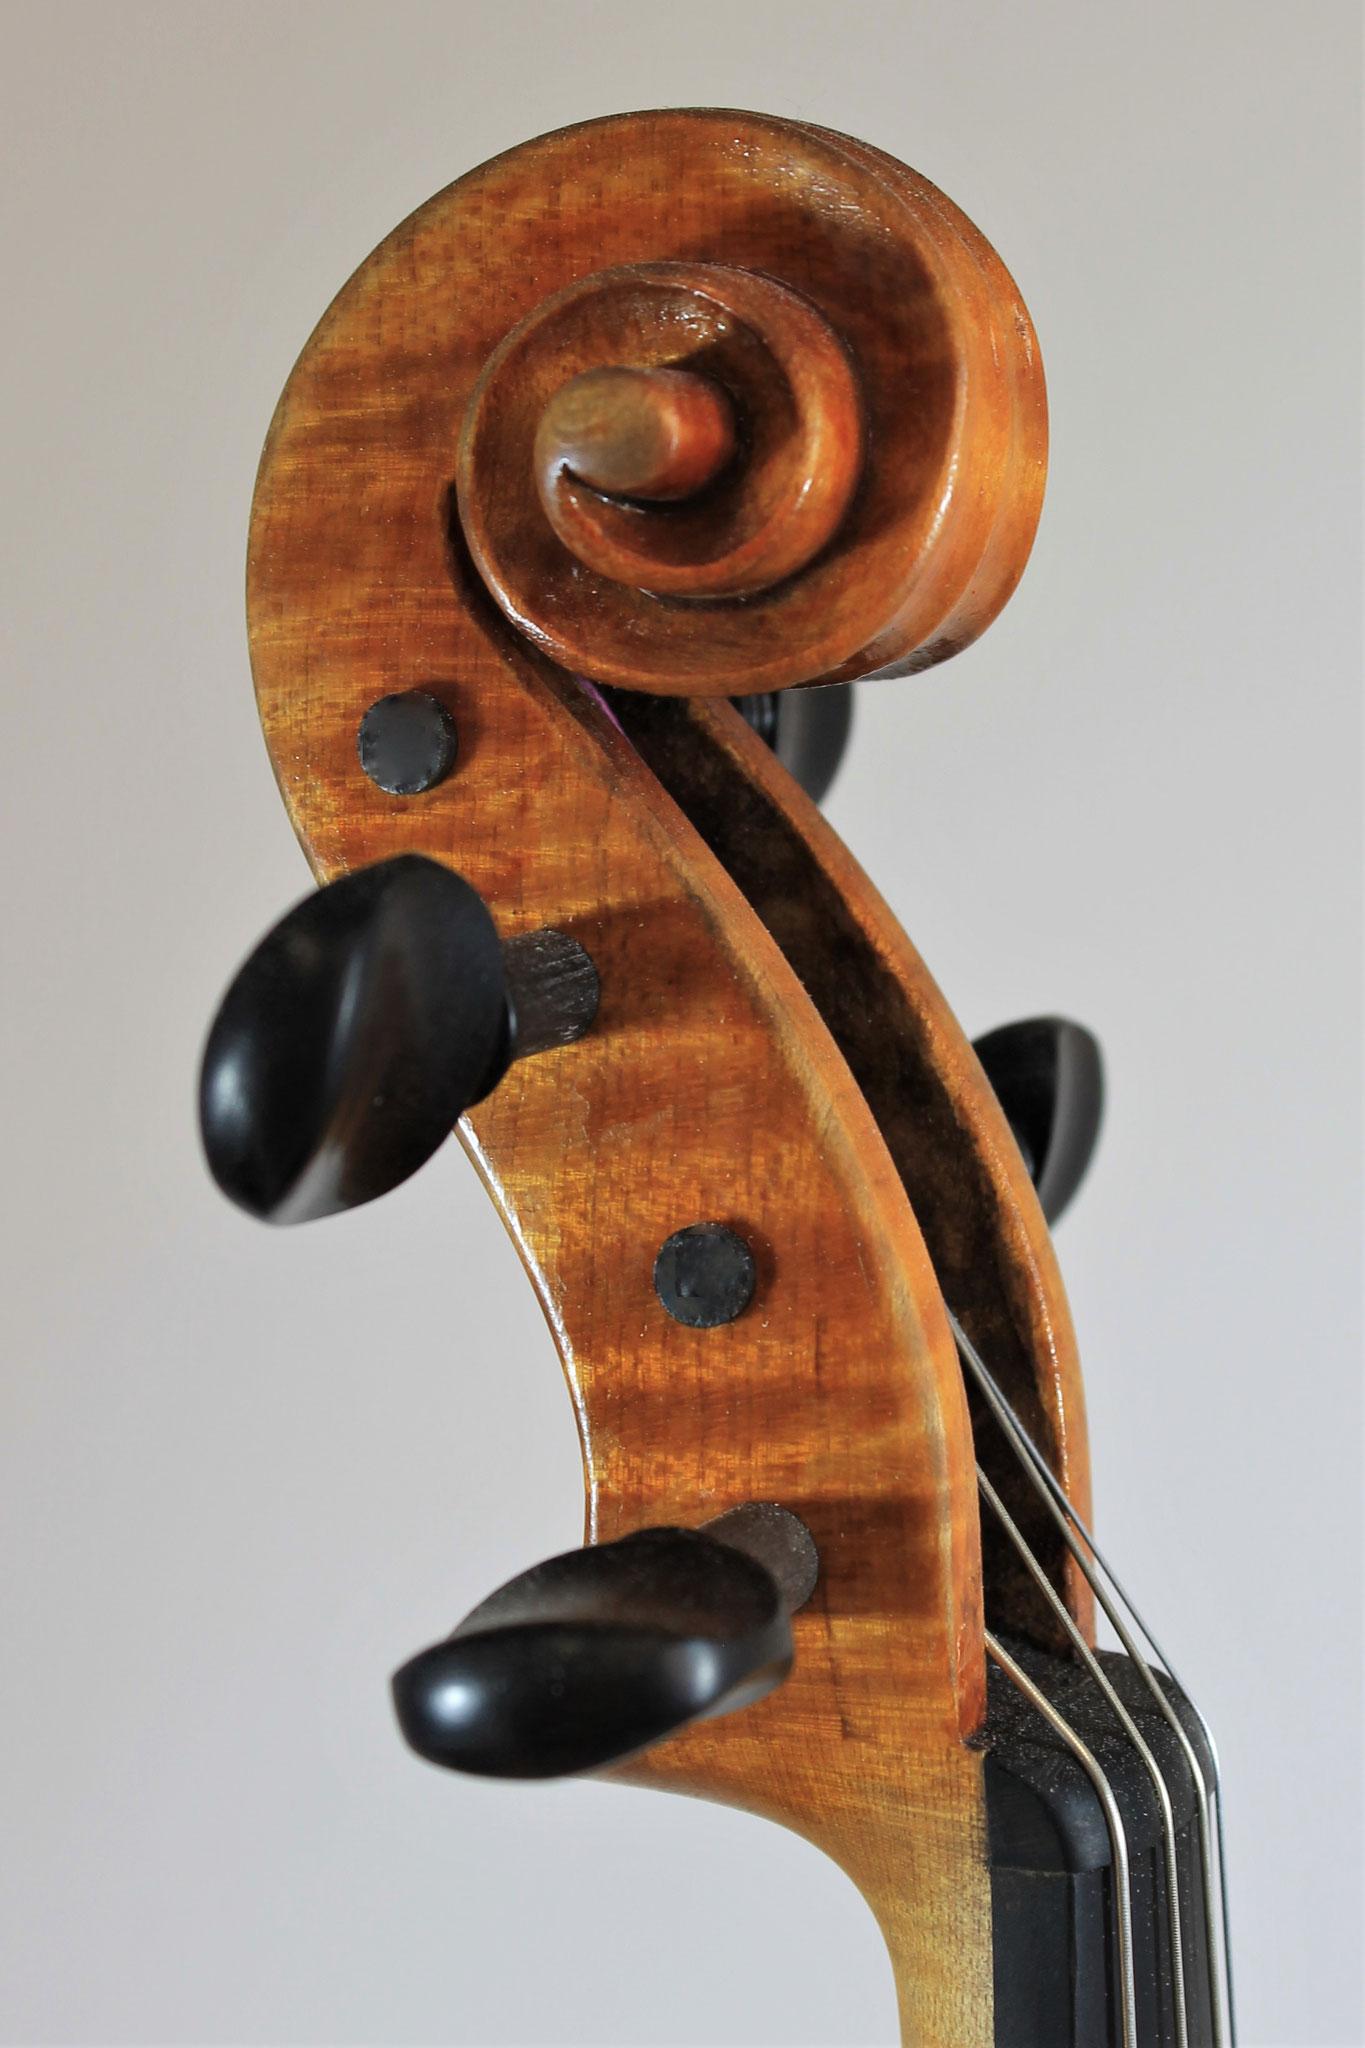 G. B. Guadagnini, 2017 (40,7 cm)